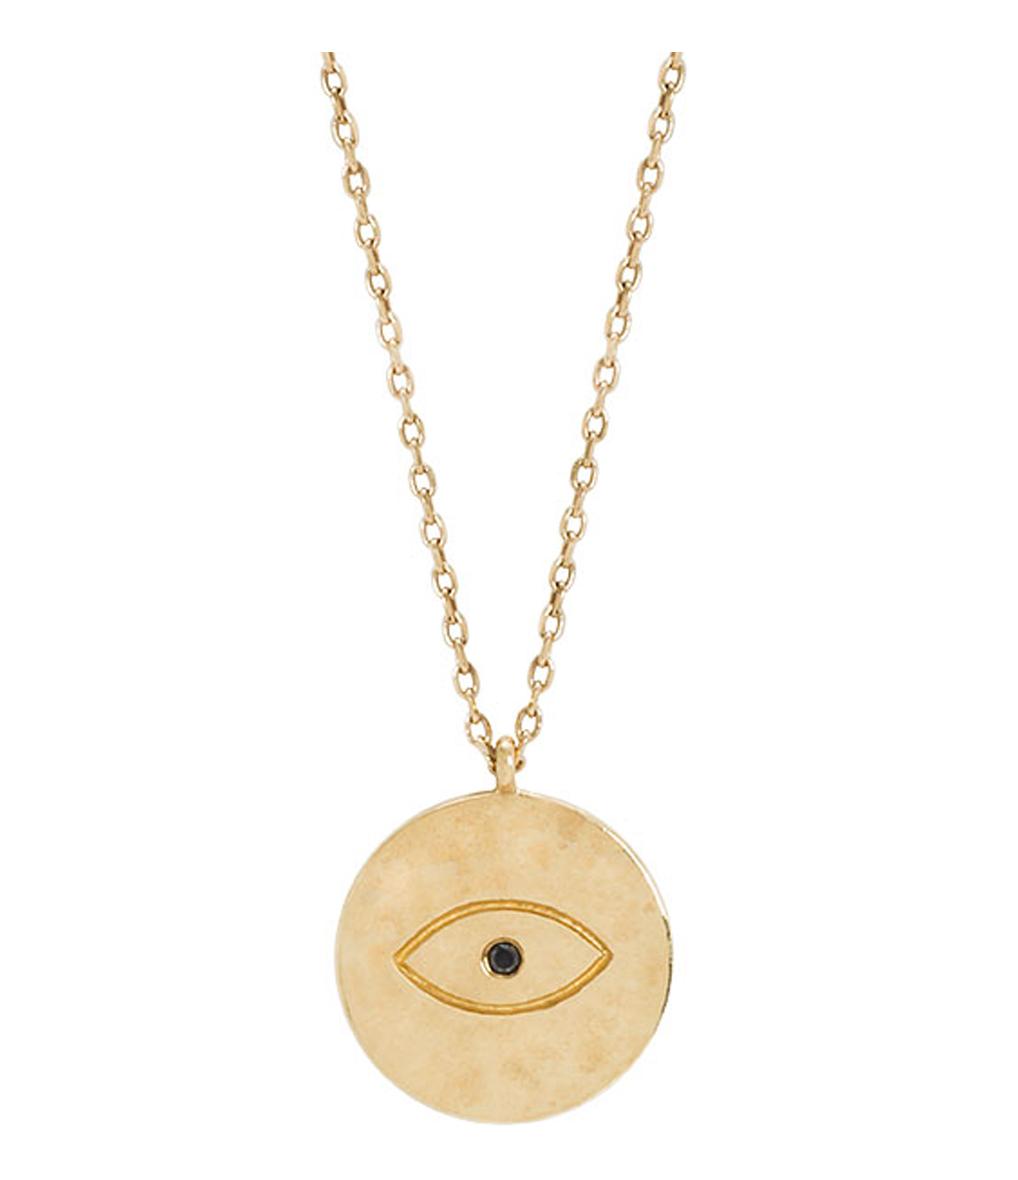 Collier Long Médaille Oeil Ibiza 9K